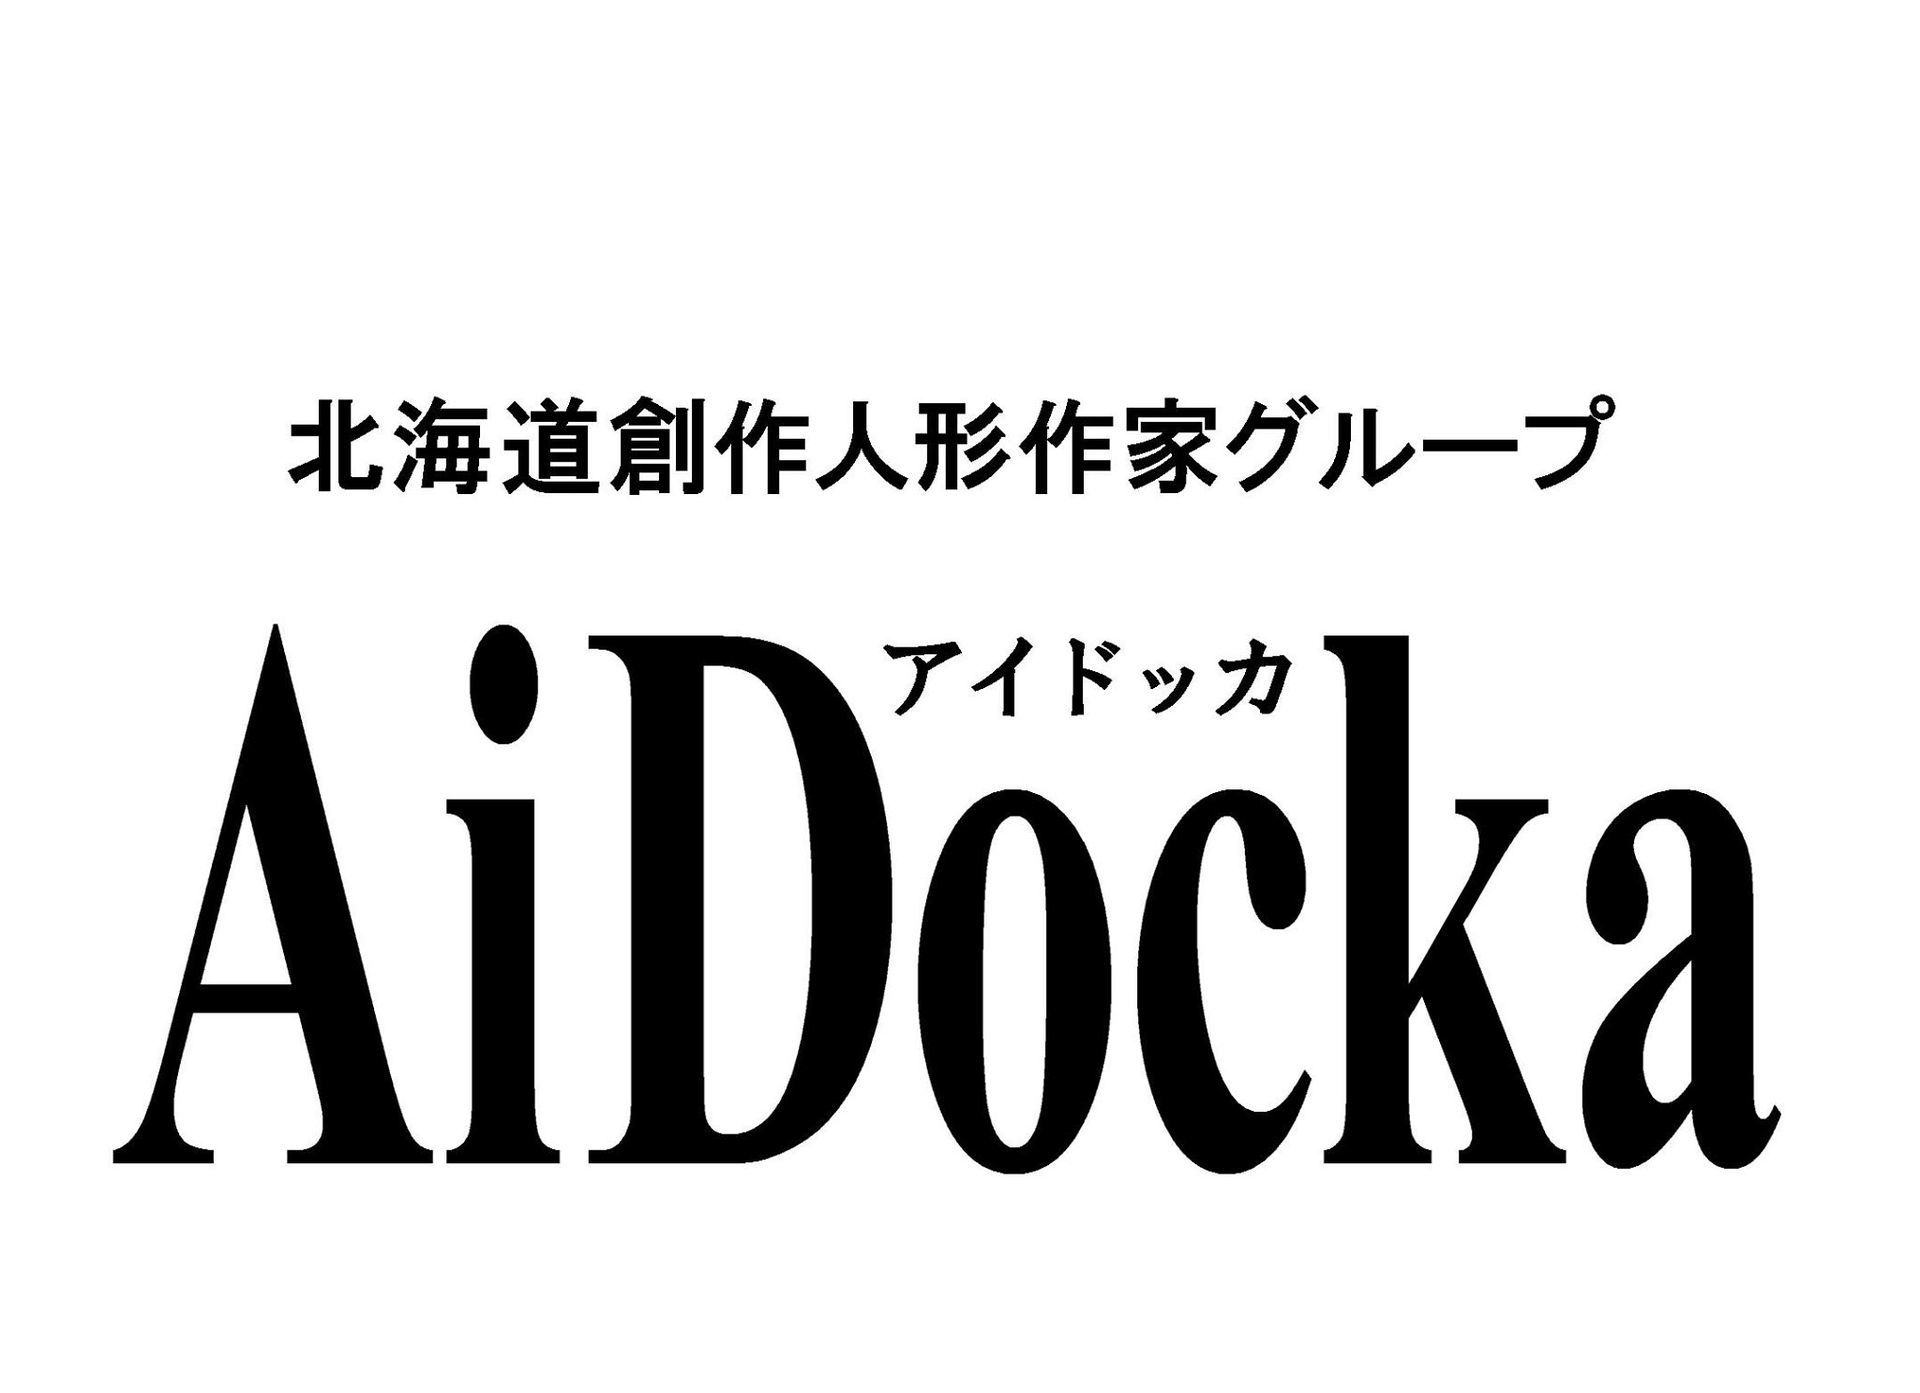 北海道創作人形作家グループ AiDocka.jpg